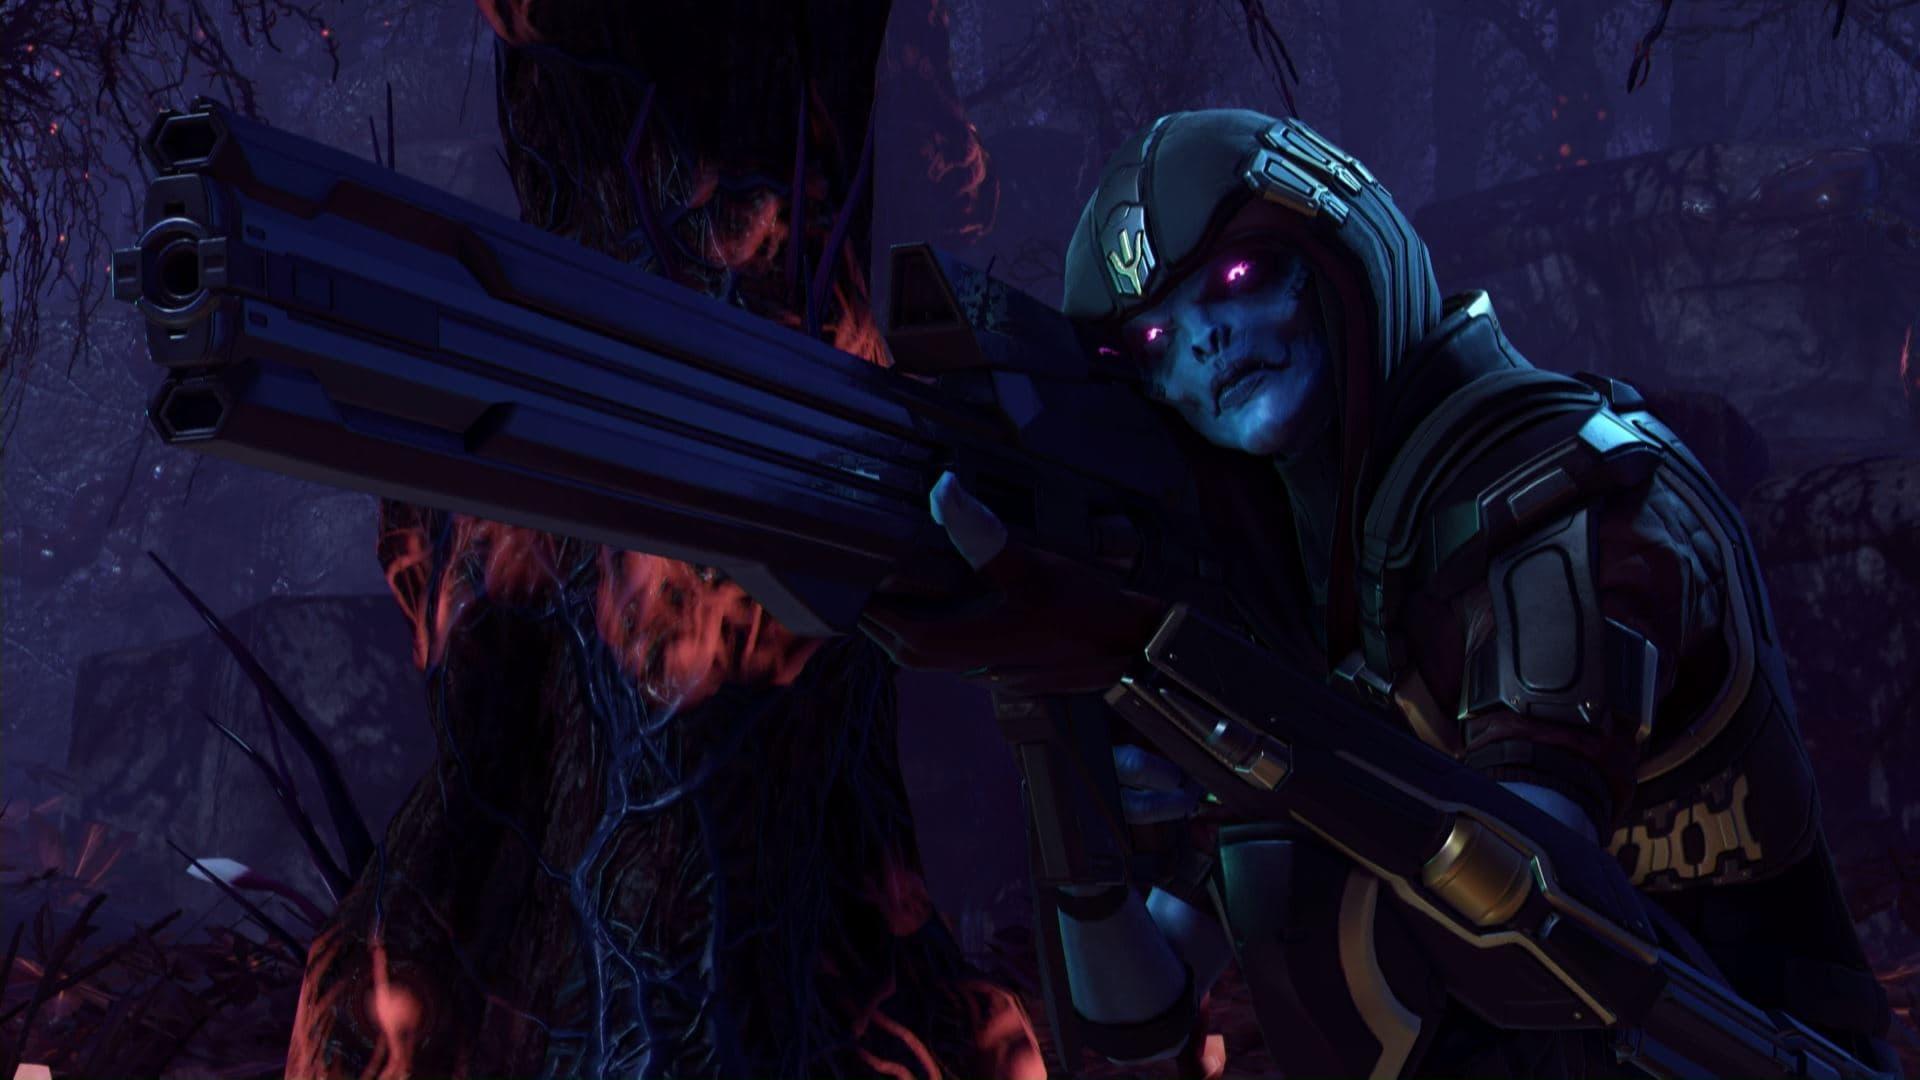 XCOM 2 - War of the Chosen Xbox One